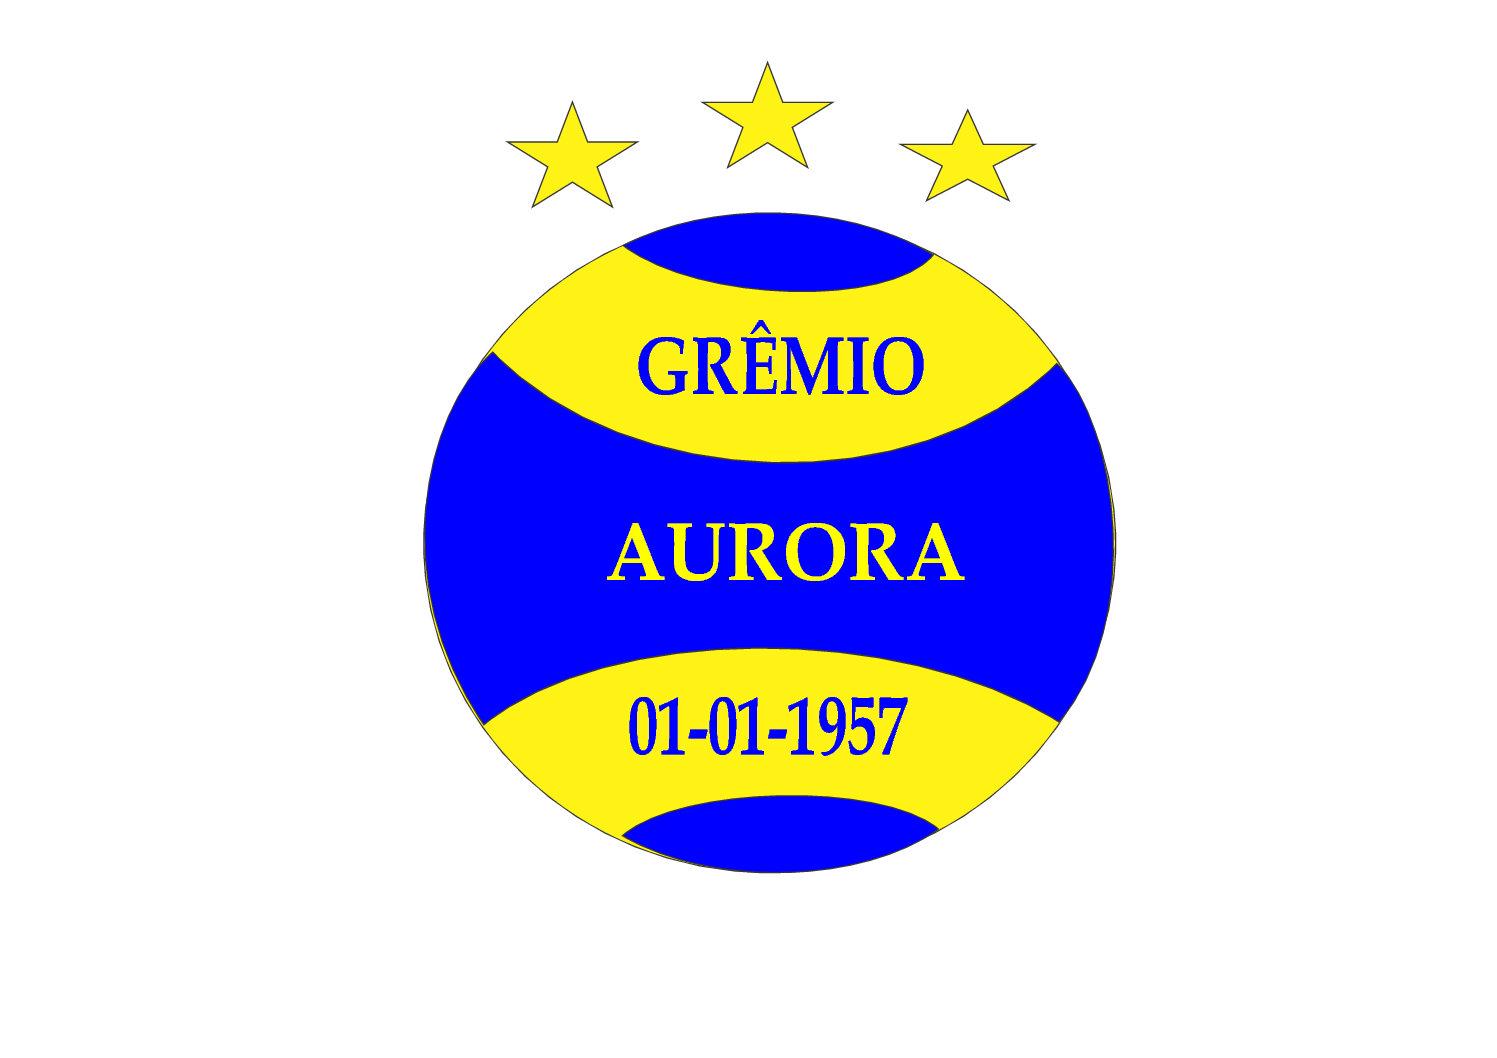 FARDAMENTO EQUIPE PRINCIPAL DO GRÊMIO ESPORTIVO AURORA DE QUINZE DE NOVEMBRO/RS.